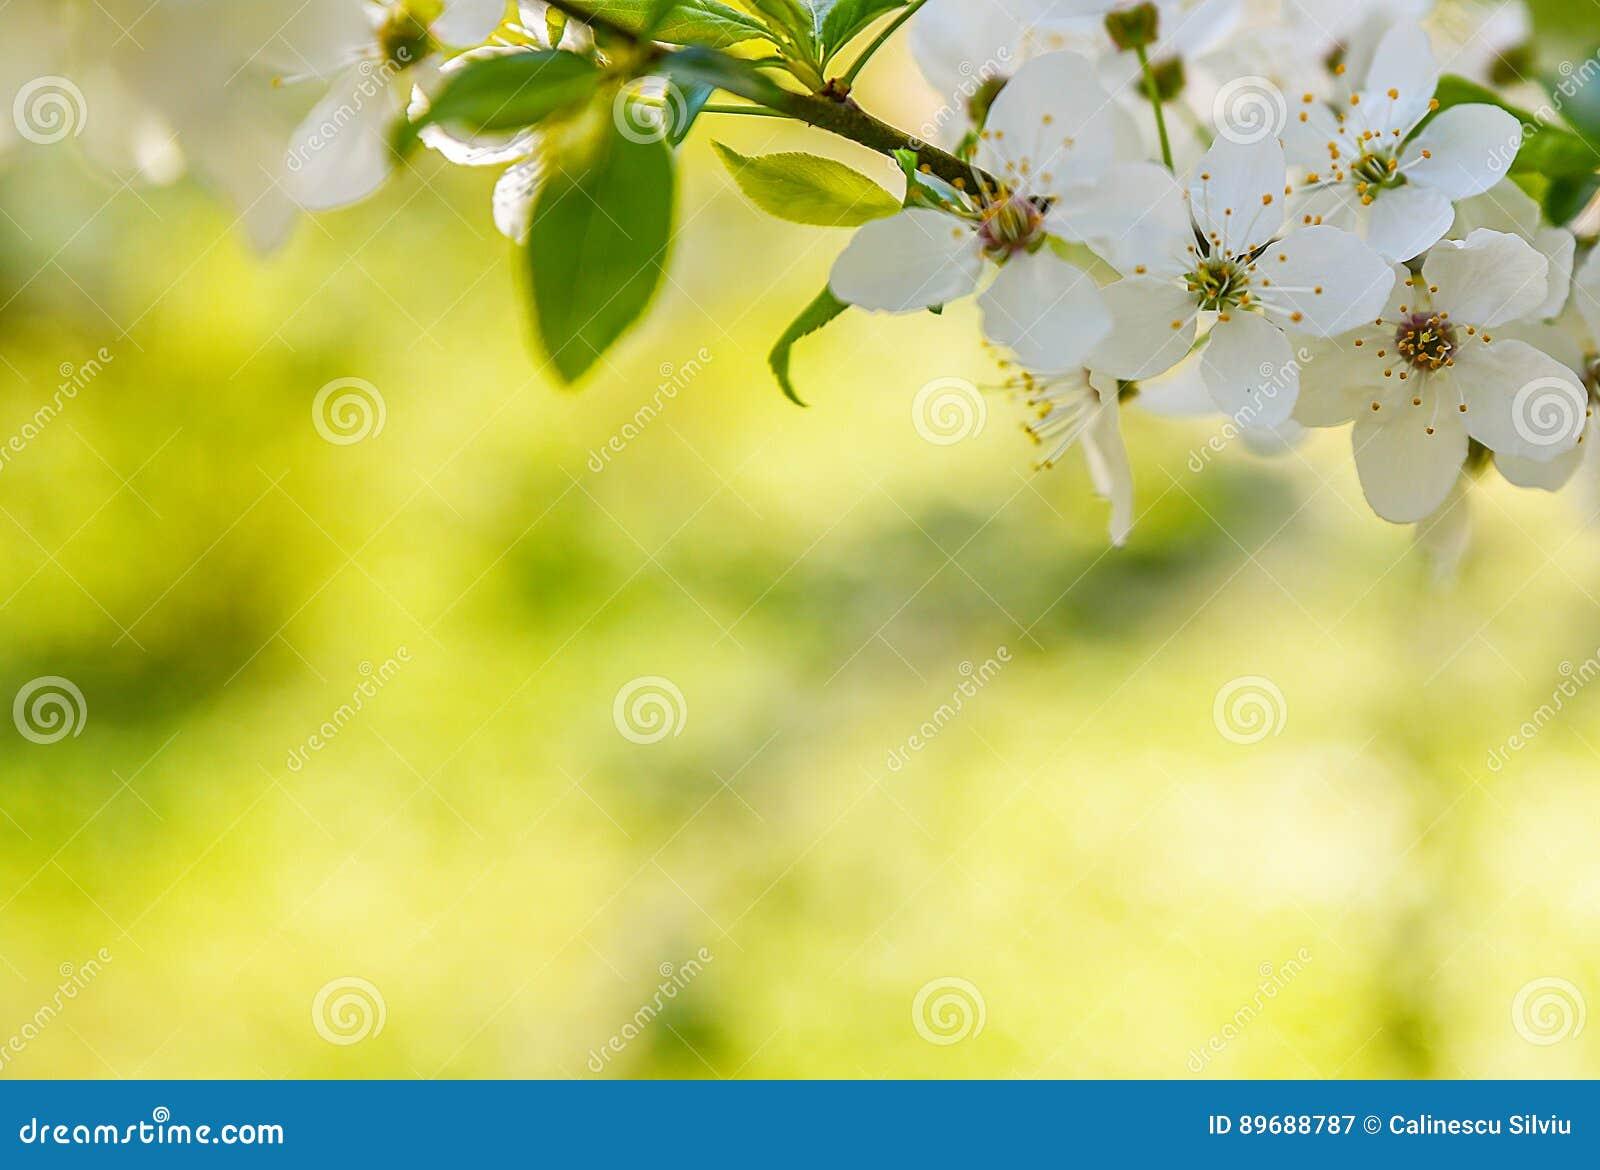 Seasonal Spring Flowers Trees Background Stock Image Image Of